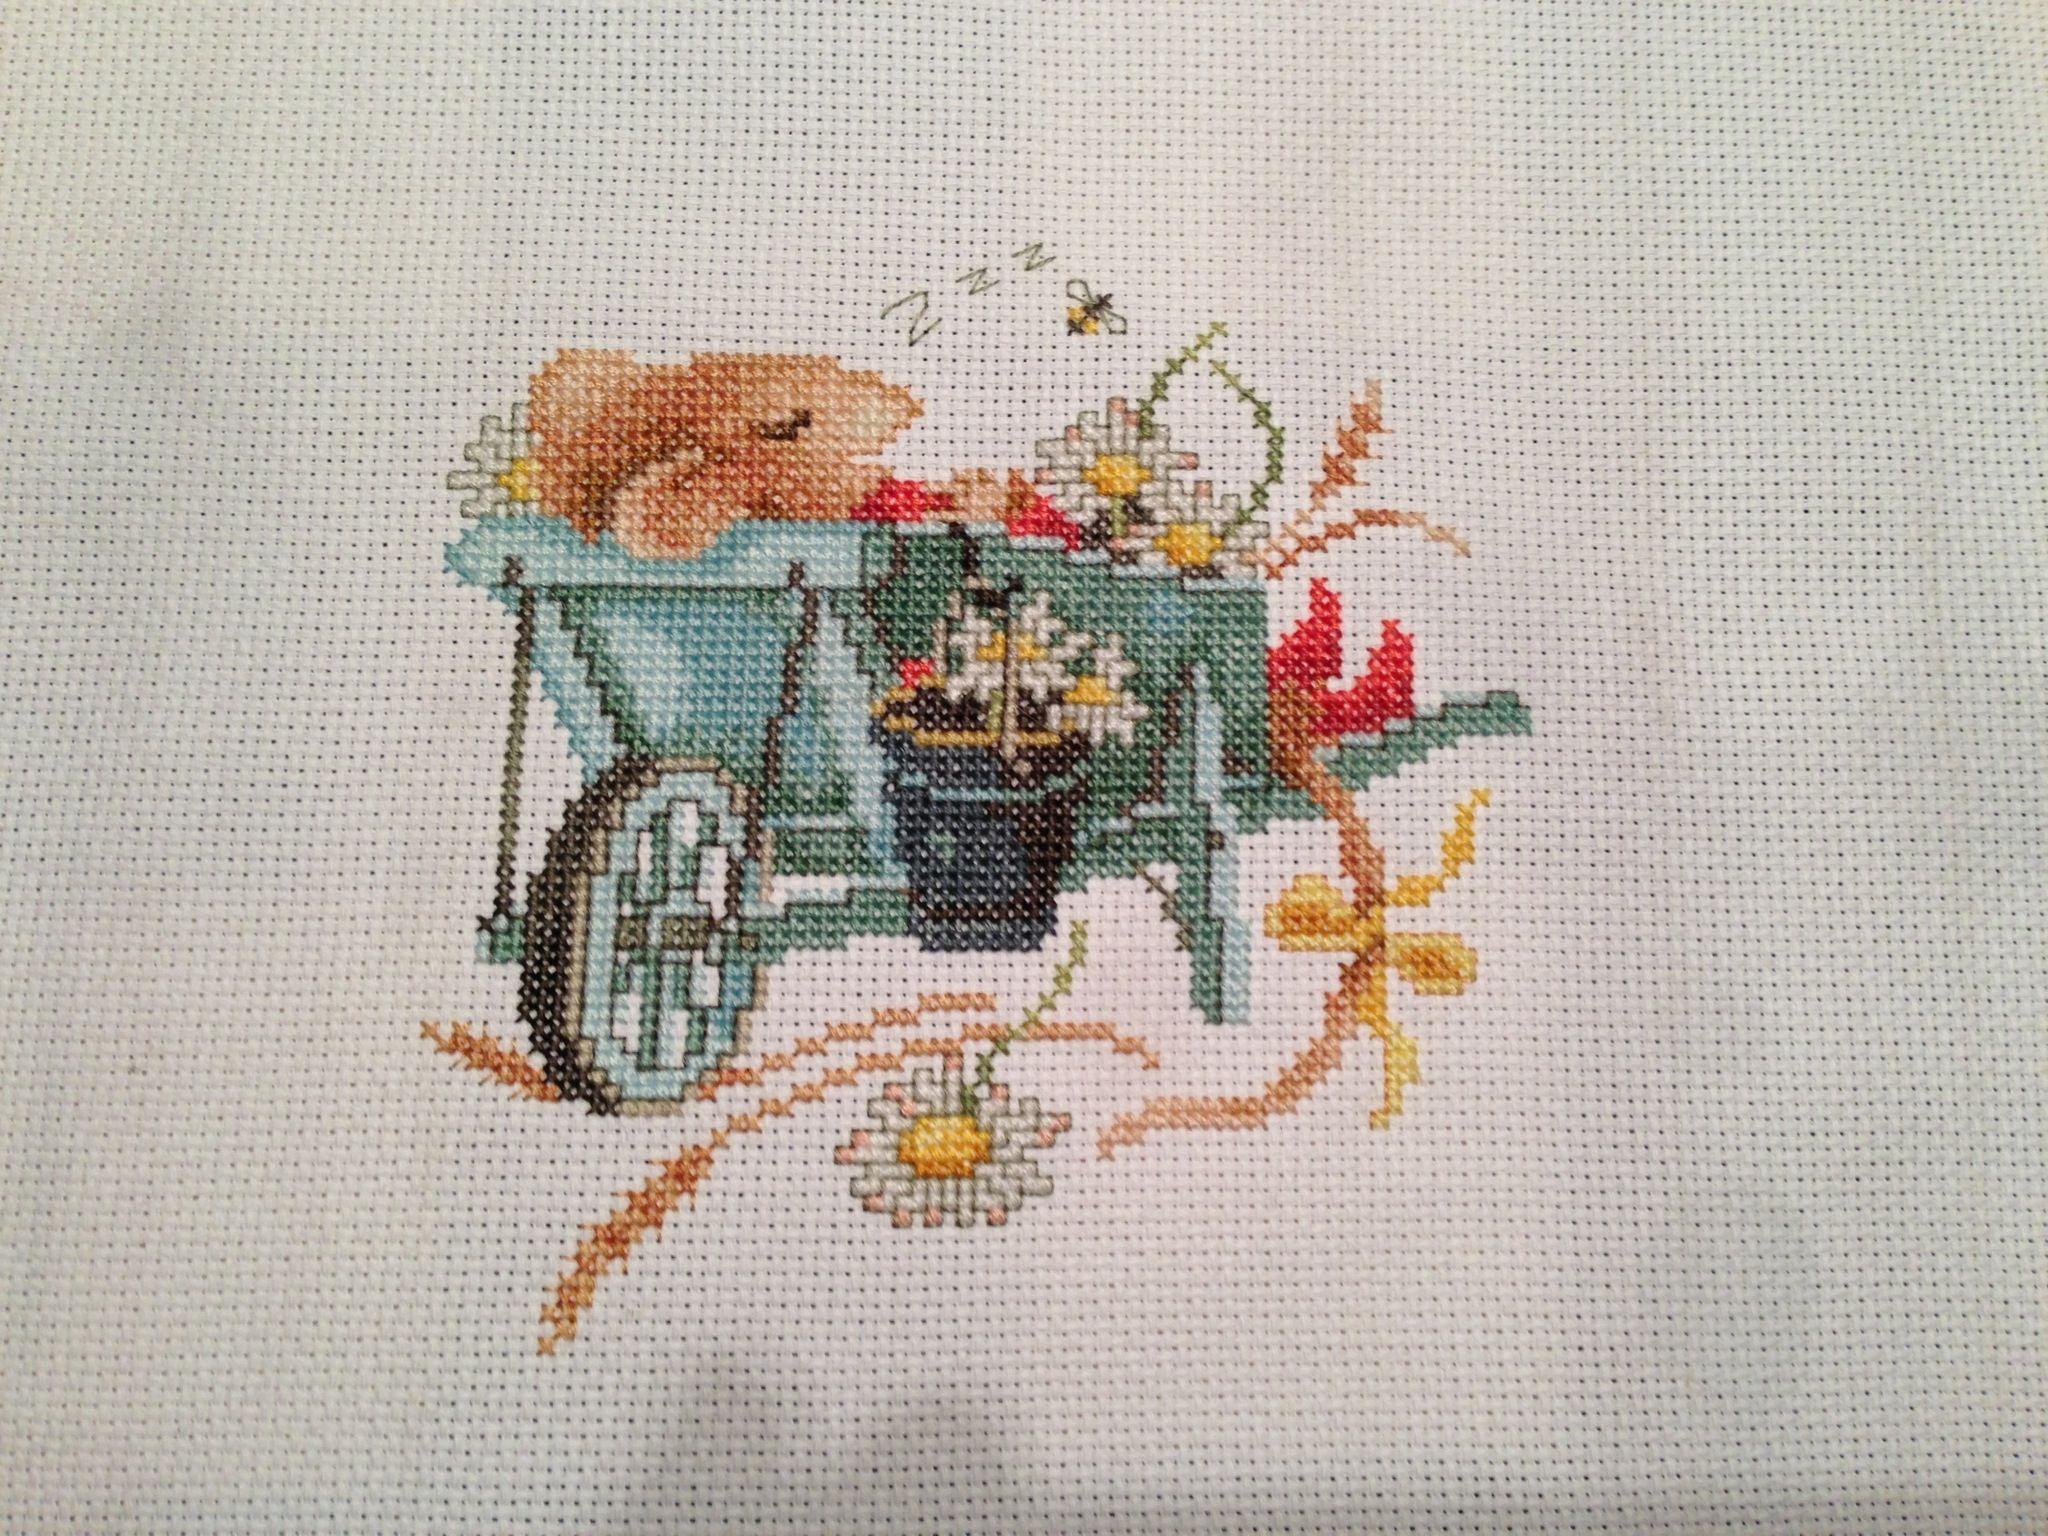 Vera Mouse criss stitch | SKS Finished Cross Stitch and Beading ...